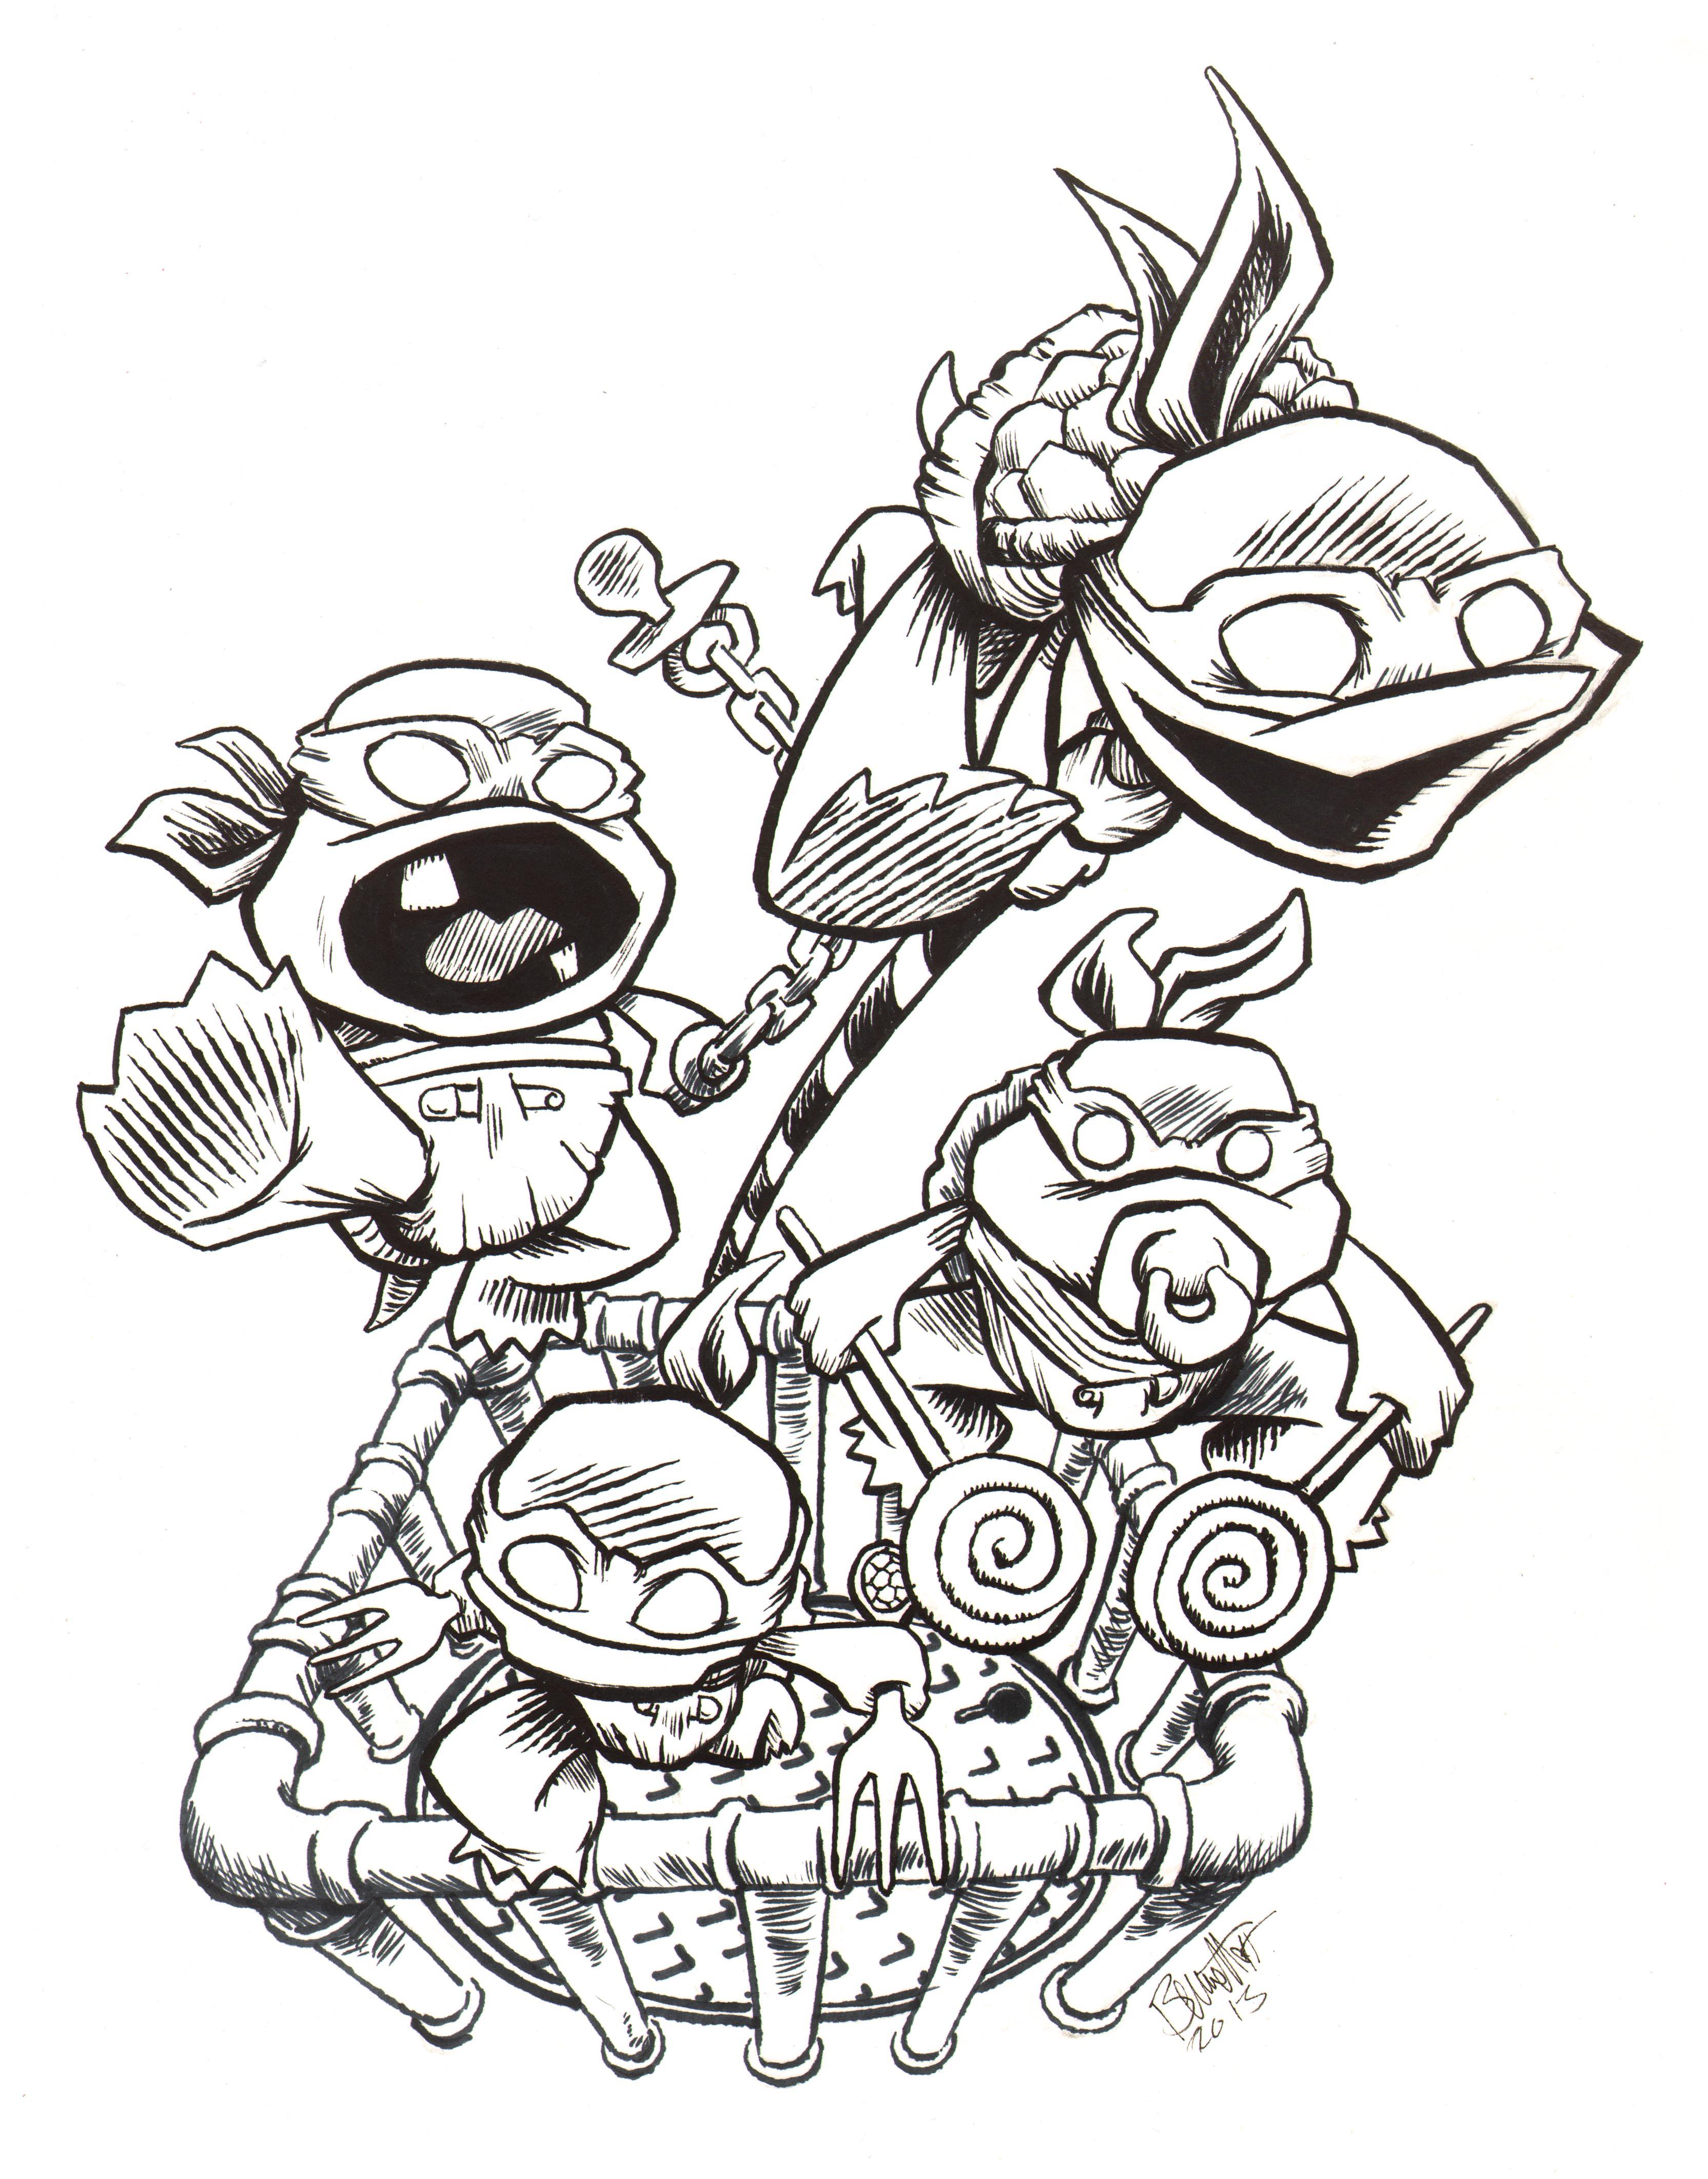 Cool Ninja Drawing At Getdrawings Com Free For Personal